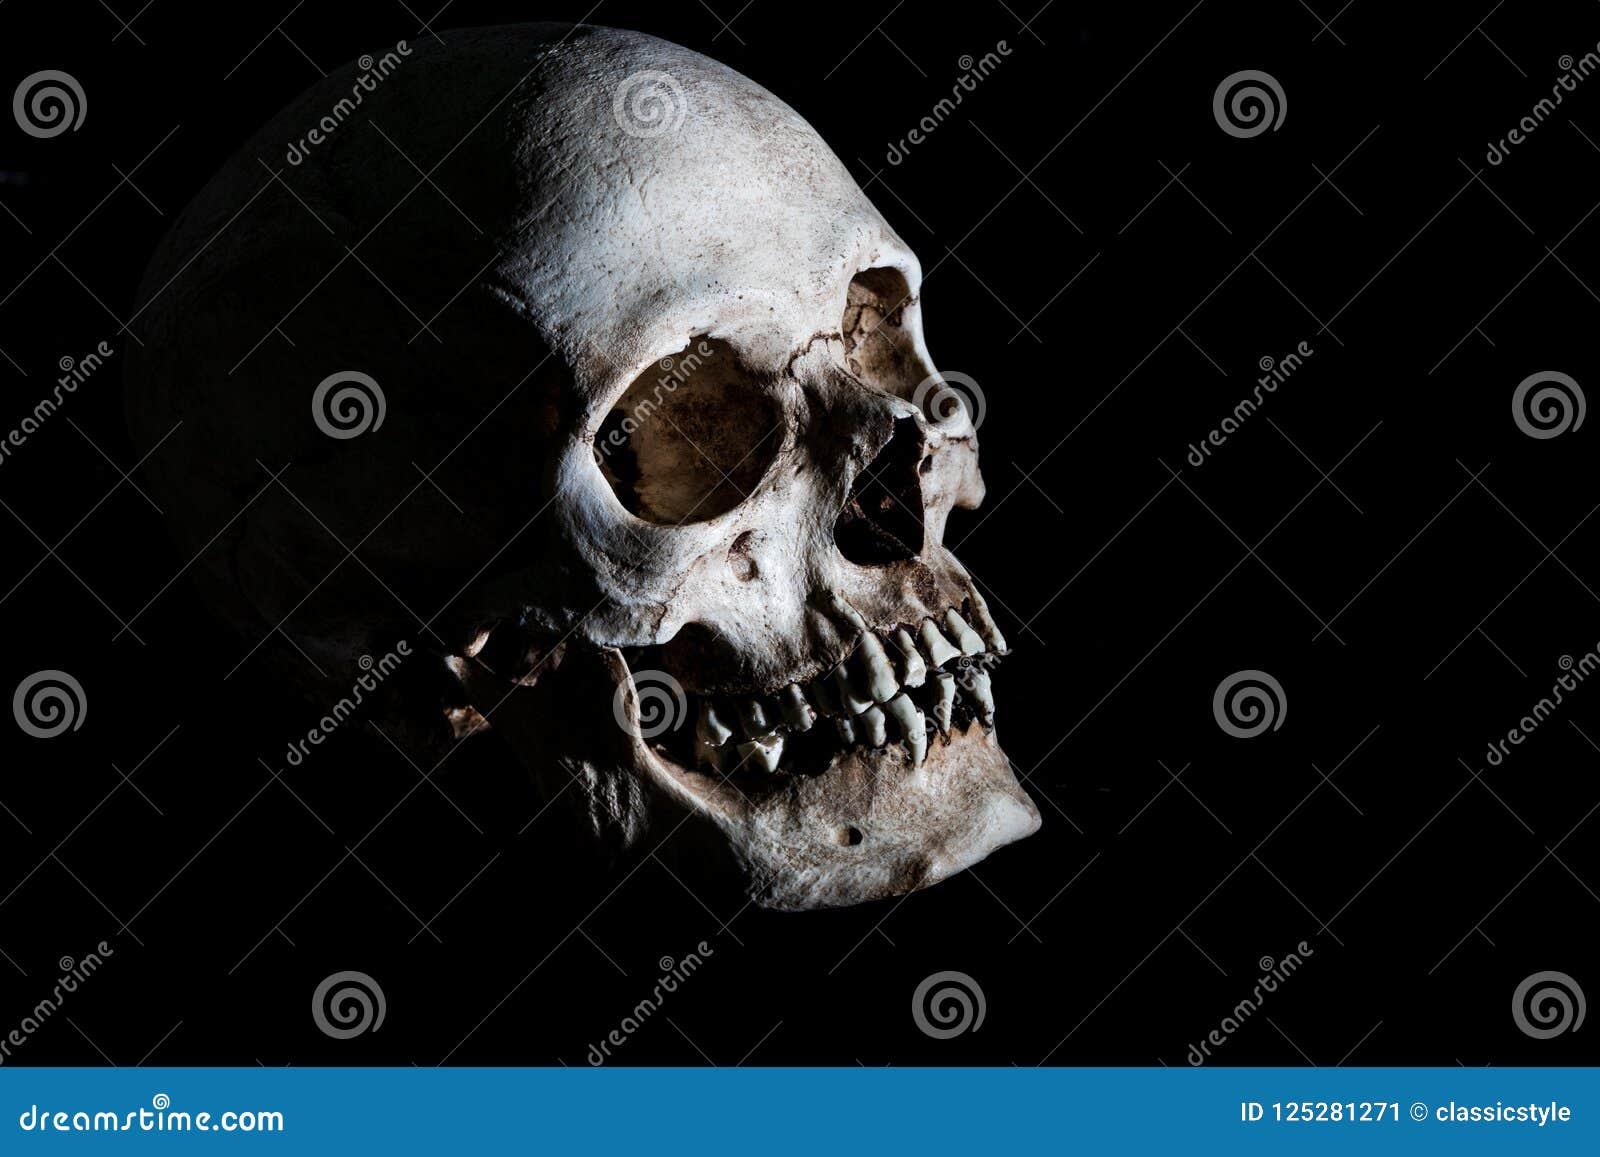 Human Skeleton Skull Head Isolated On Black Stock Image Image Of